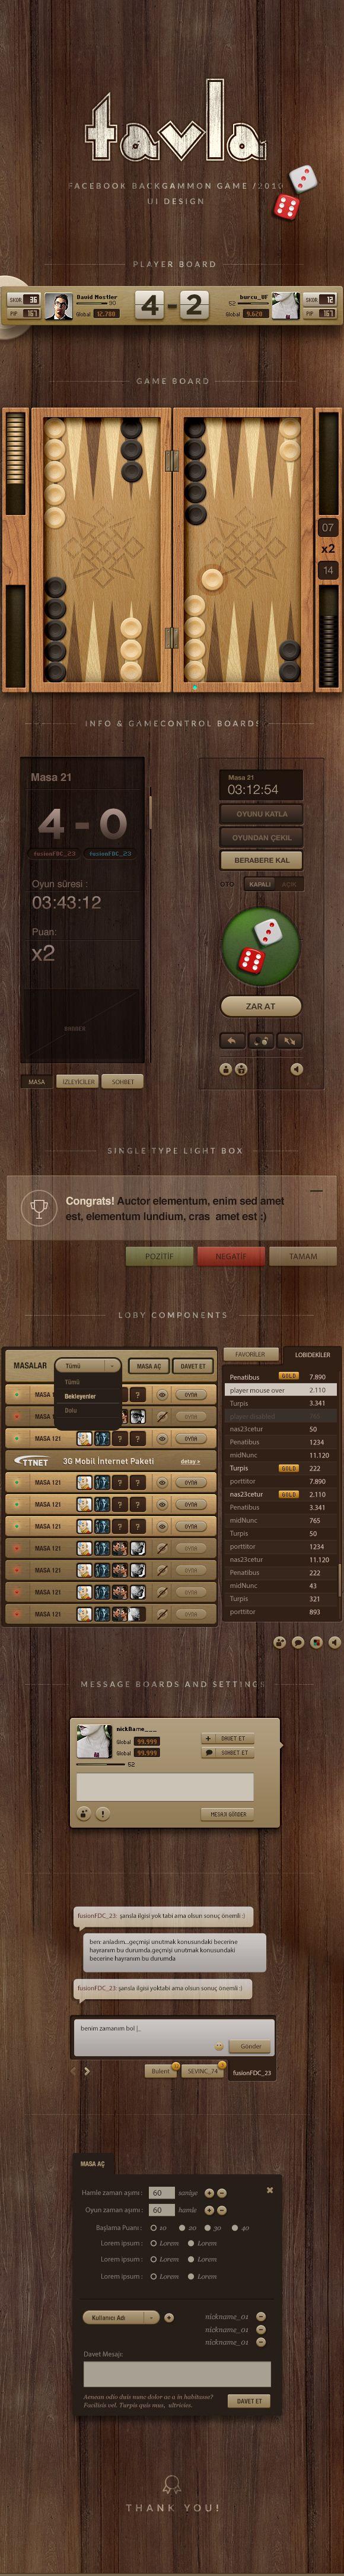 Backgammon game UI design.